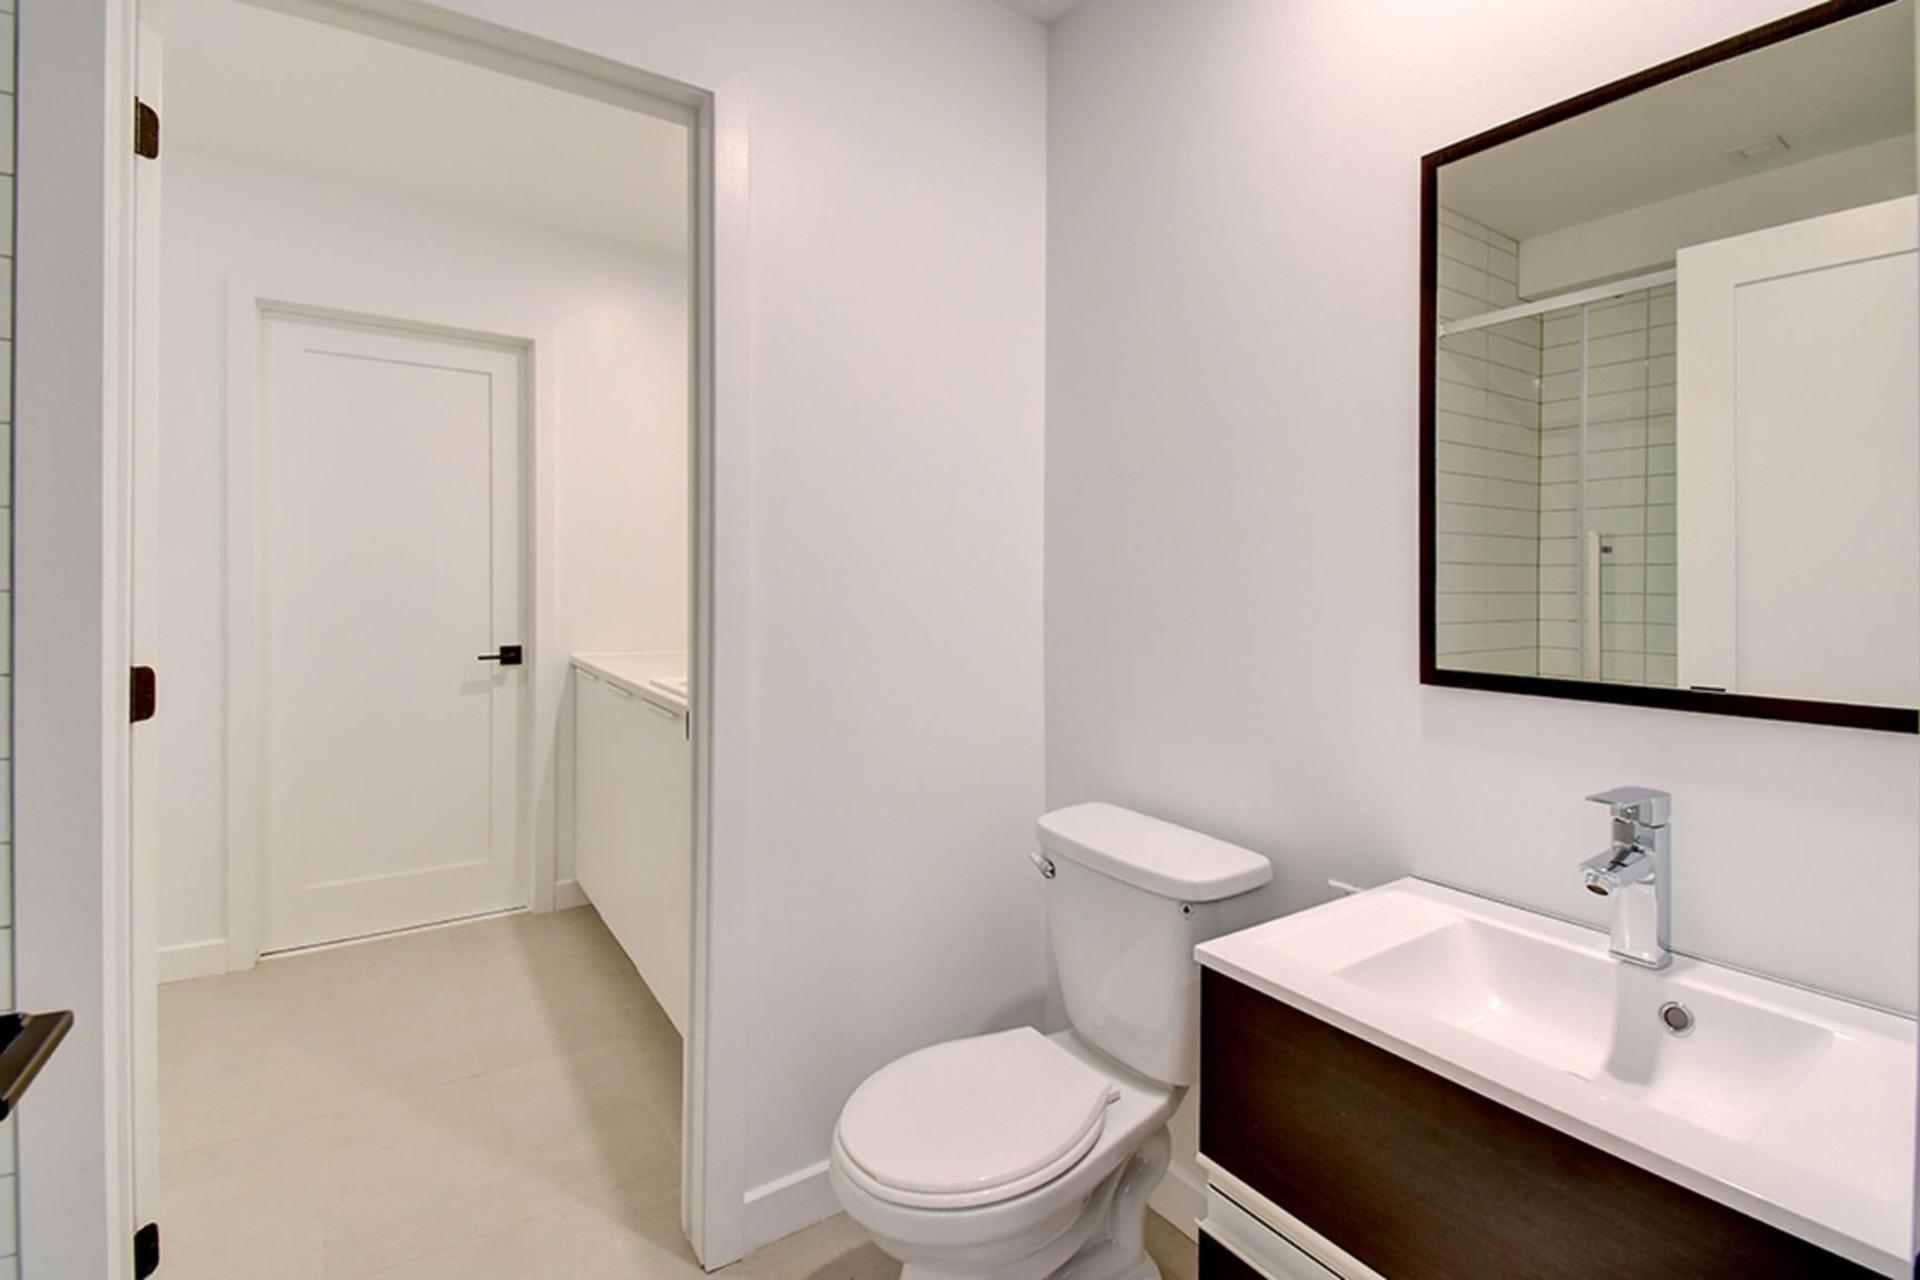 image 19 - Apartment For sale Le Vieux-Longueuil Longueuil  - 9 rooms